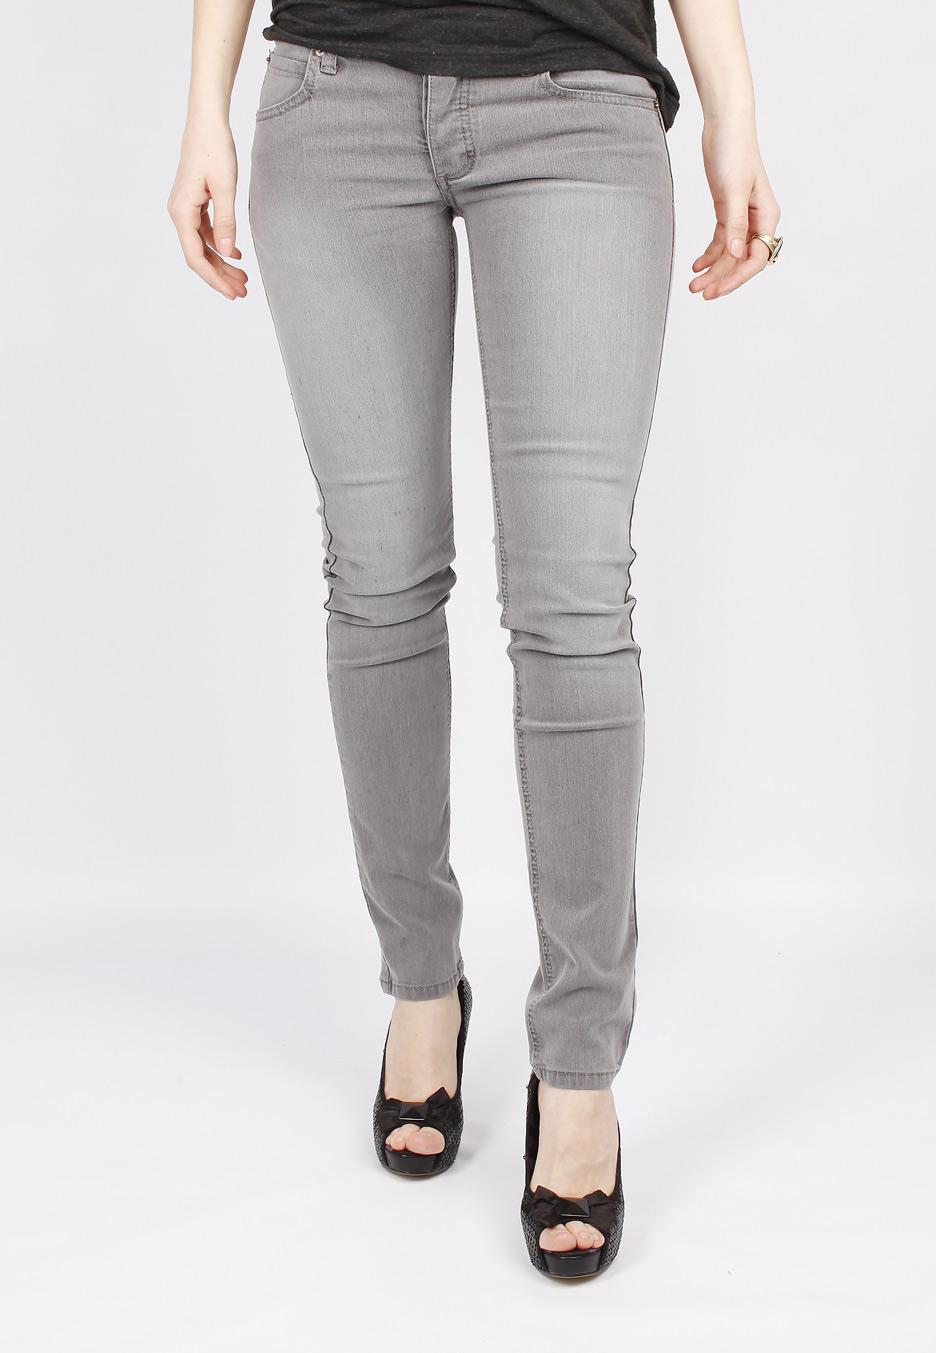 Cheap Monday - Narrow Bleach Black - Girl Jeans - Impericon.com ...